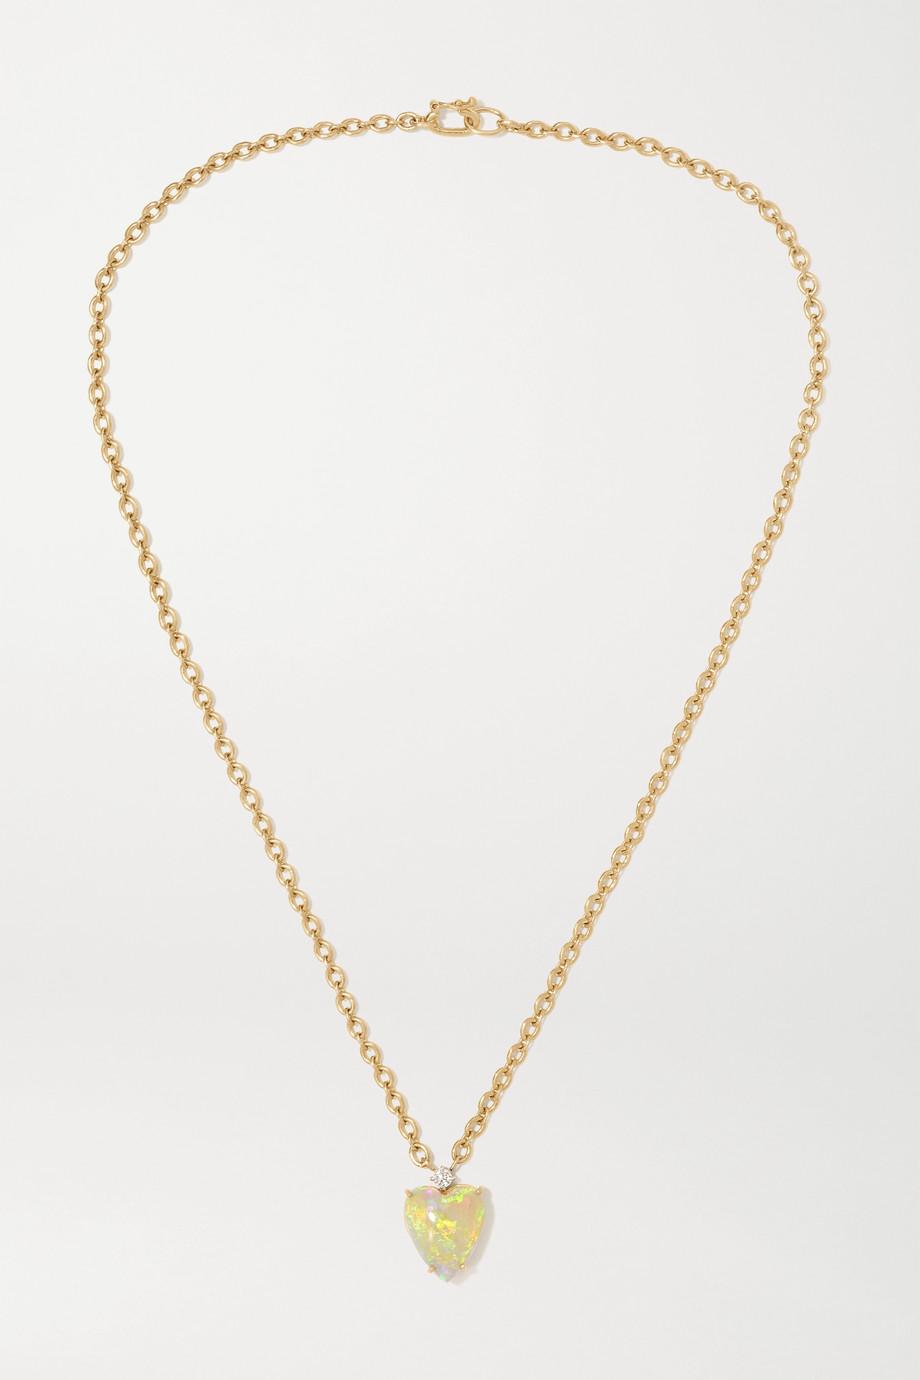 Irene Neuwirth Love 18-karat gold, diamond and opal necklace